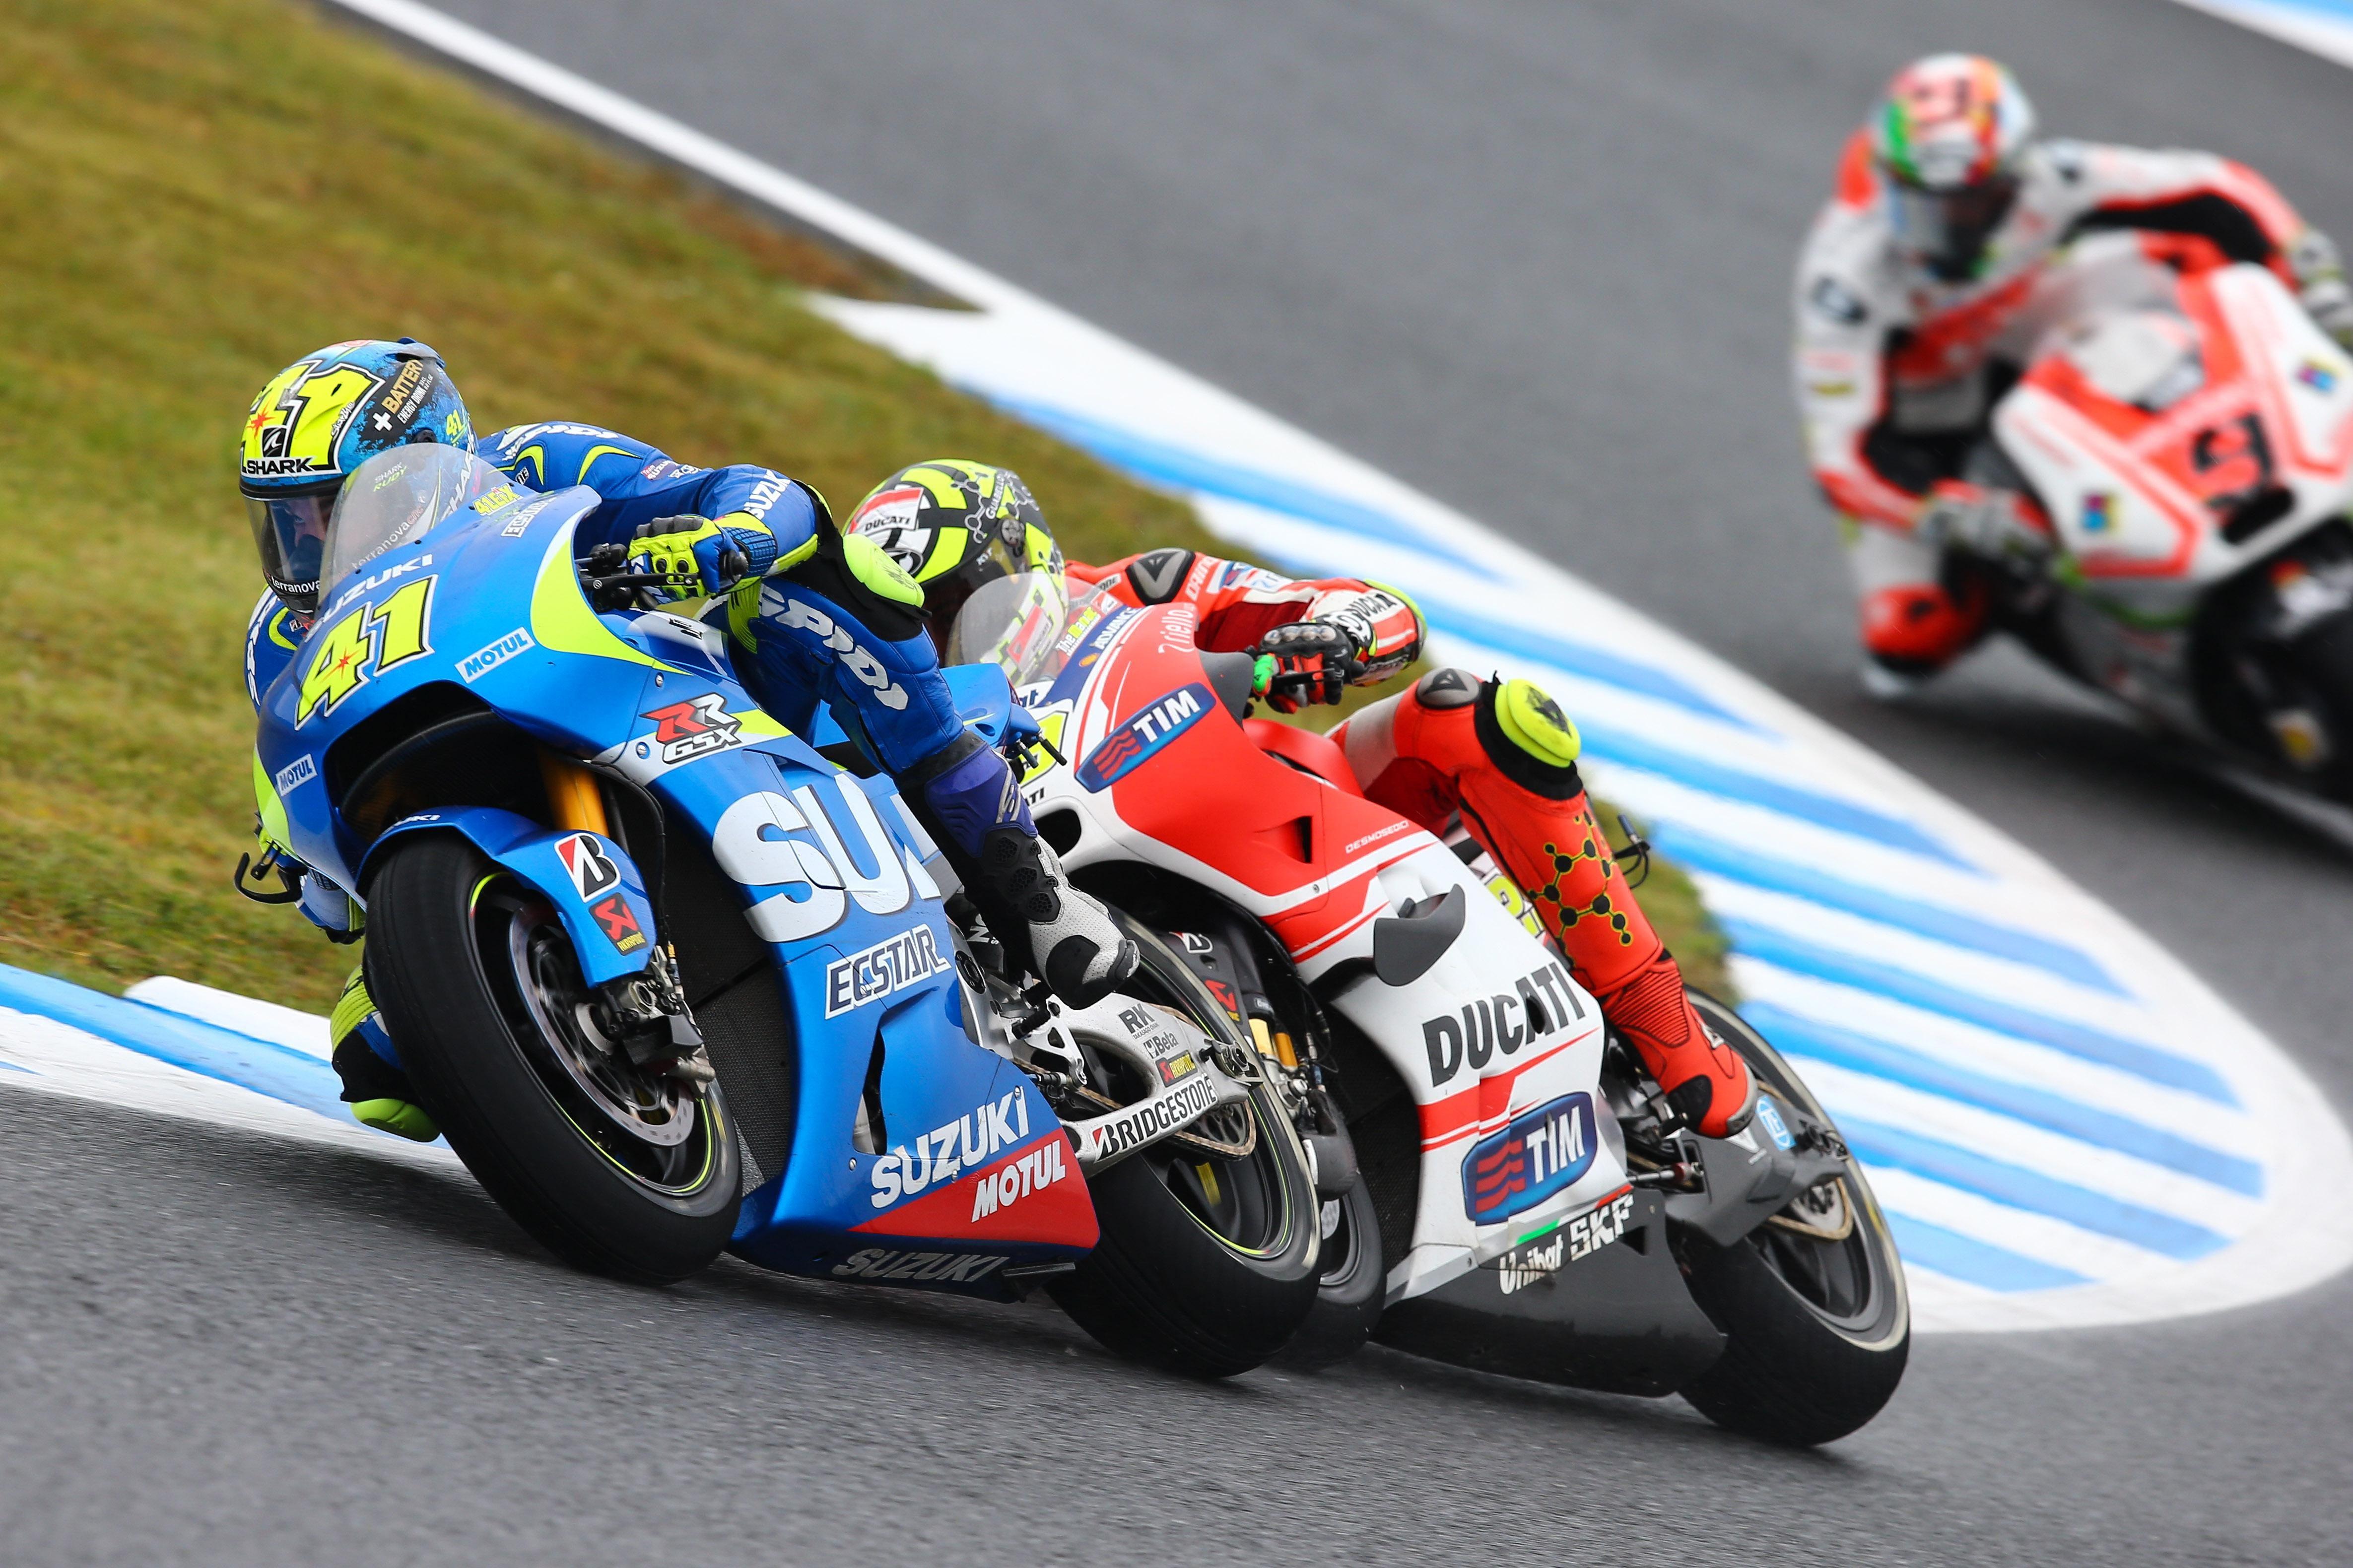 Suzuki GSX-RR / Aleix Espargaro vs Andrea Iannone